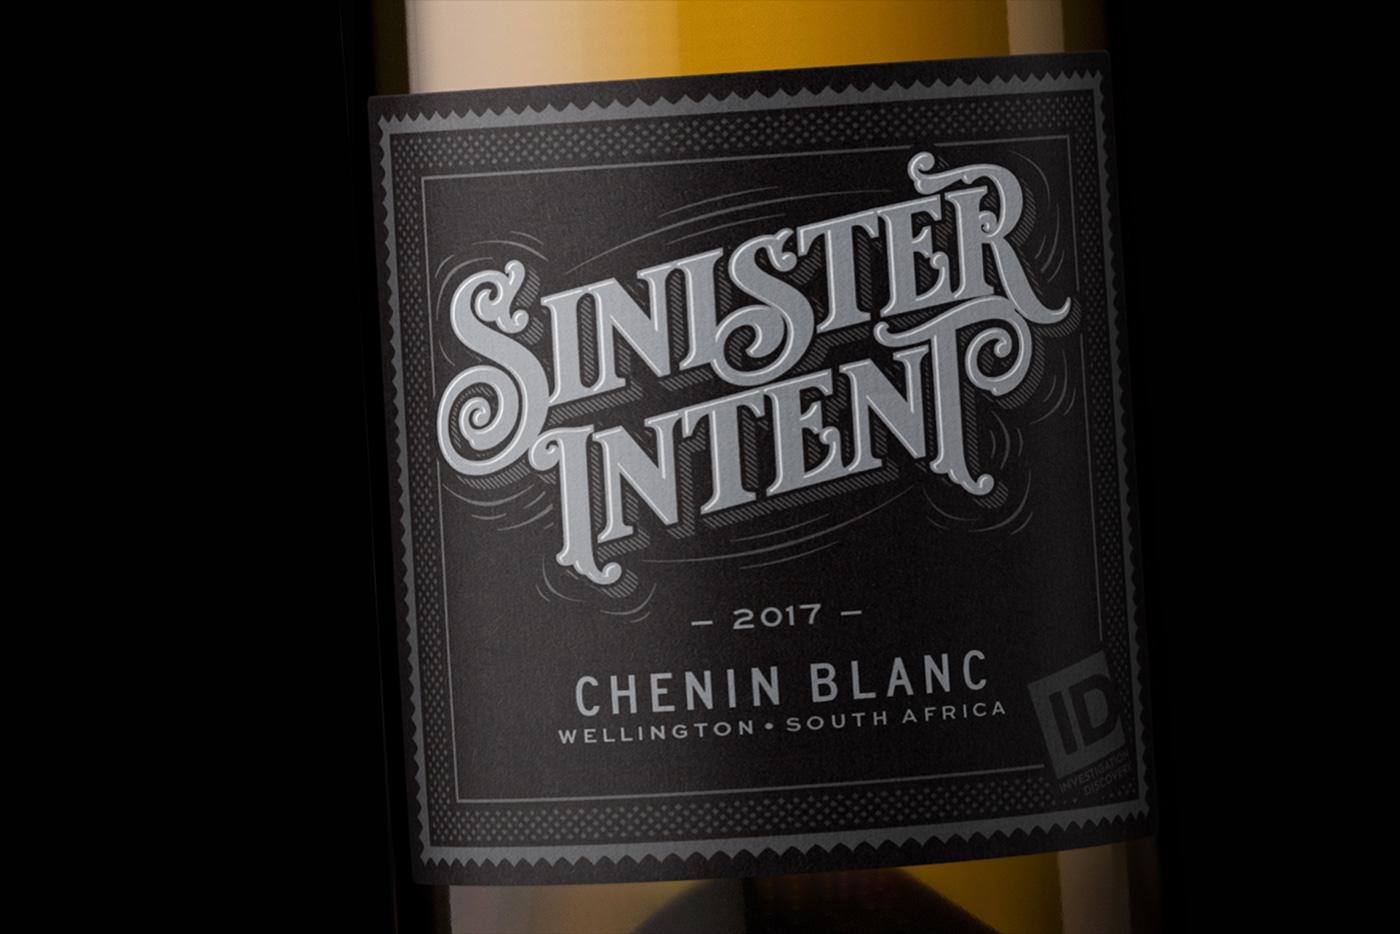 Sinister Intent - Chenin Blanc